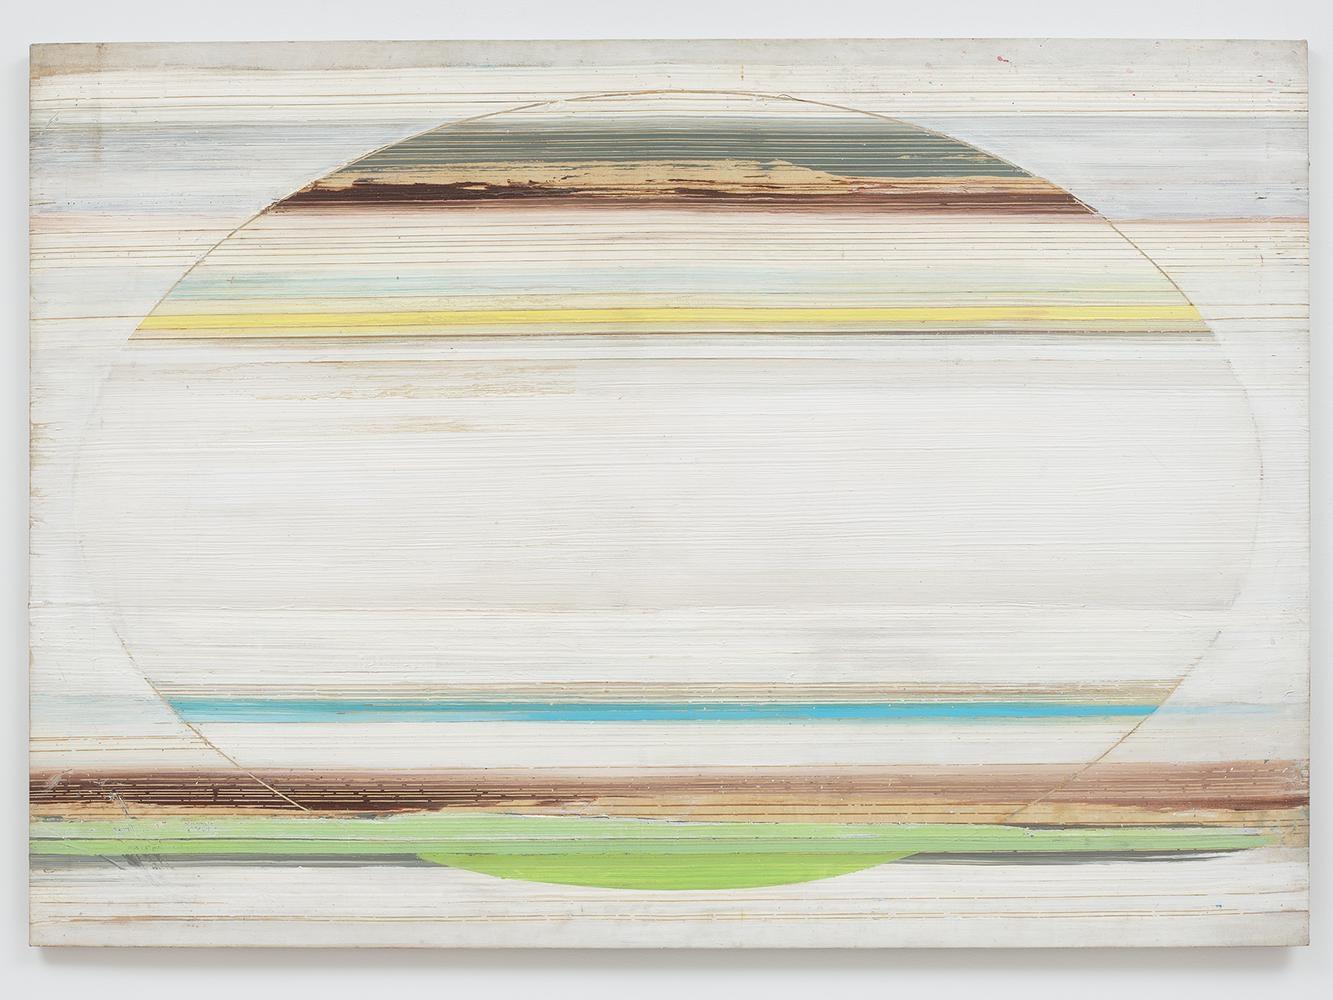 Ed Clark Untitled 1974-75 acrylic on canvas 57 1/4 x 80 1/4 inches (144.8 x 203.2 cm)